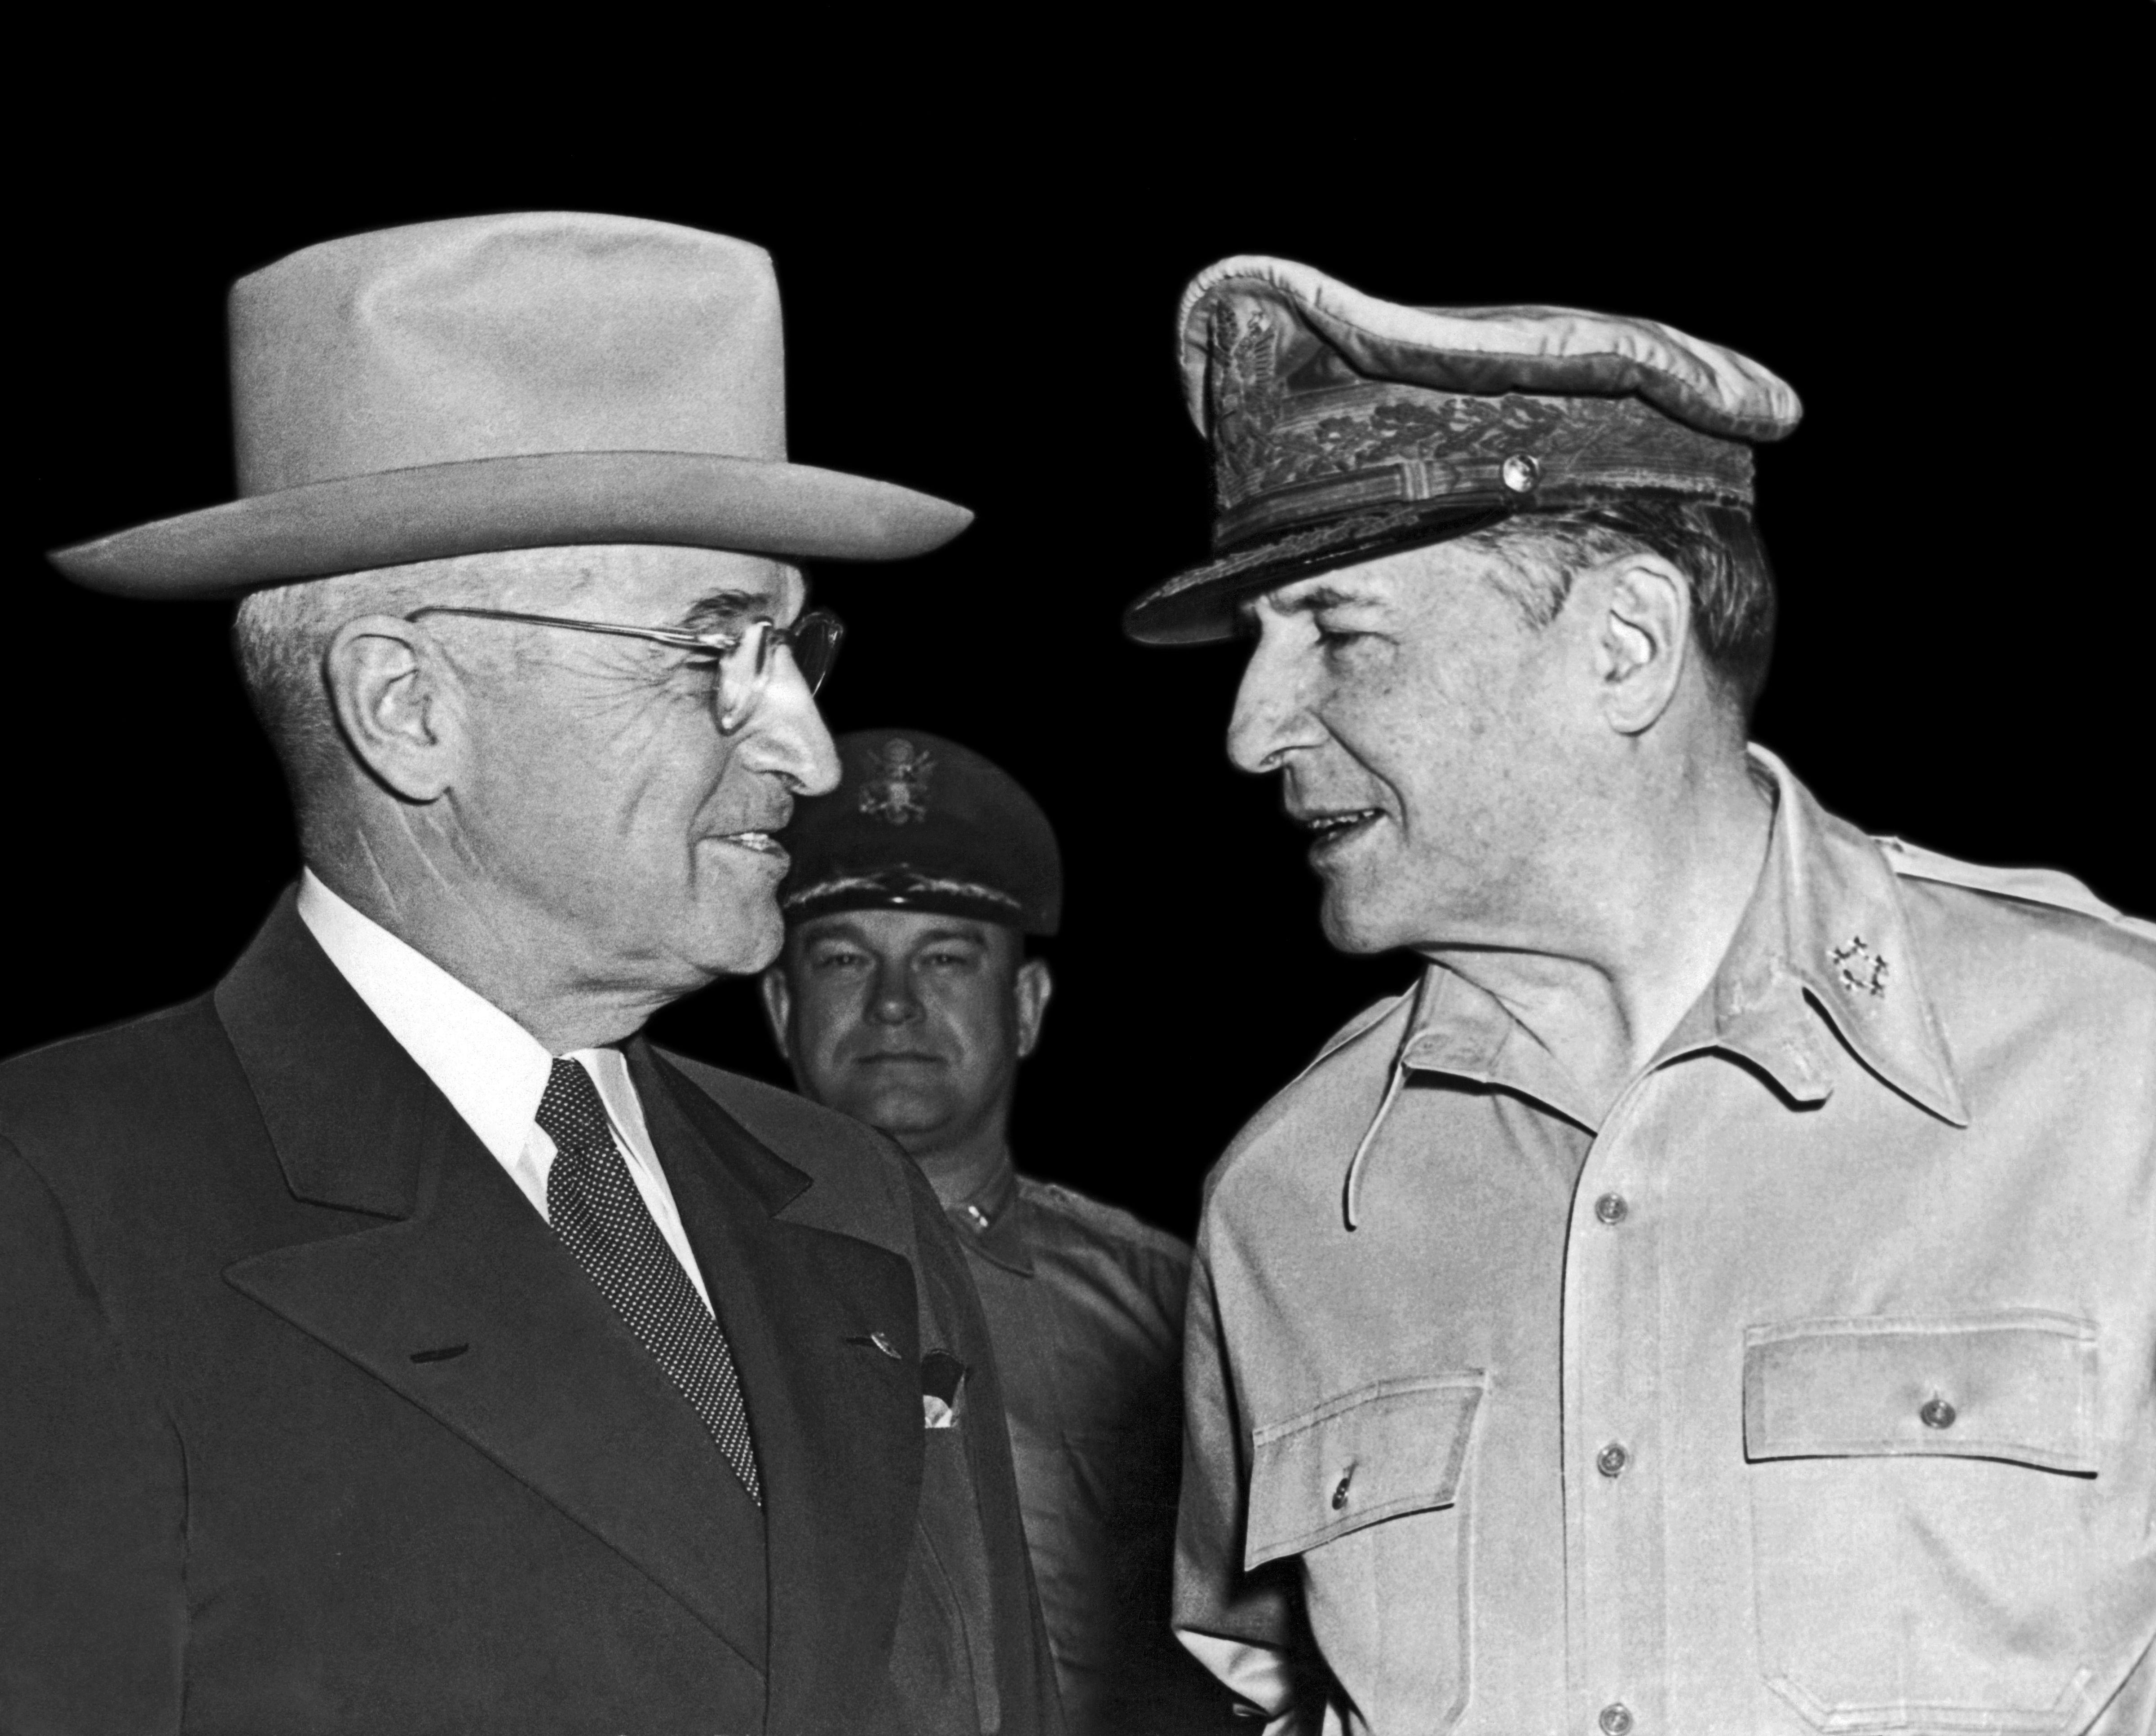 Harry Truman and MacArthur